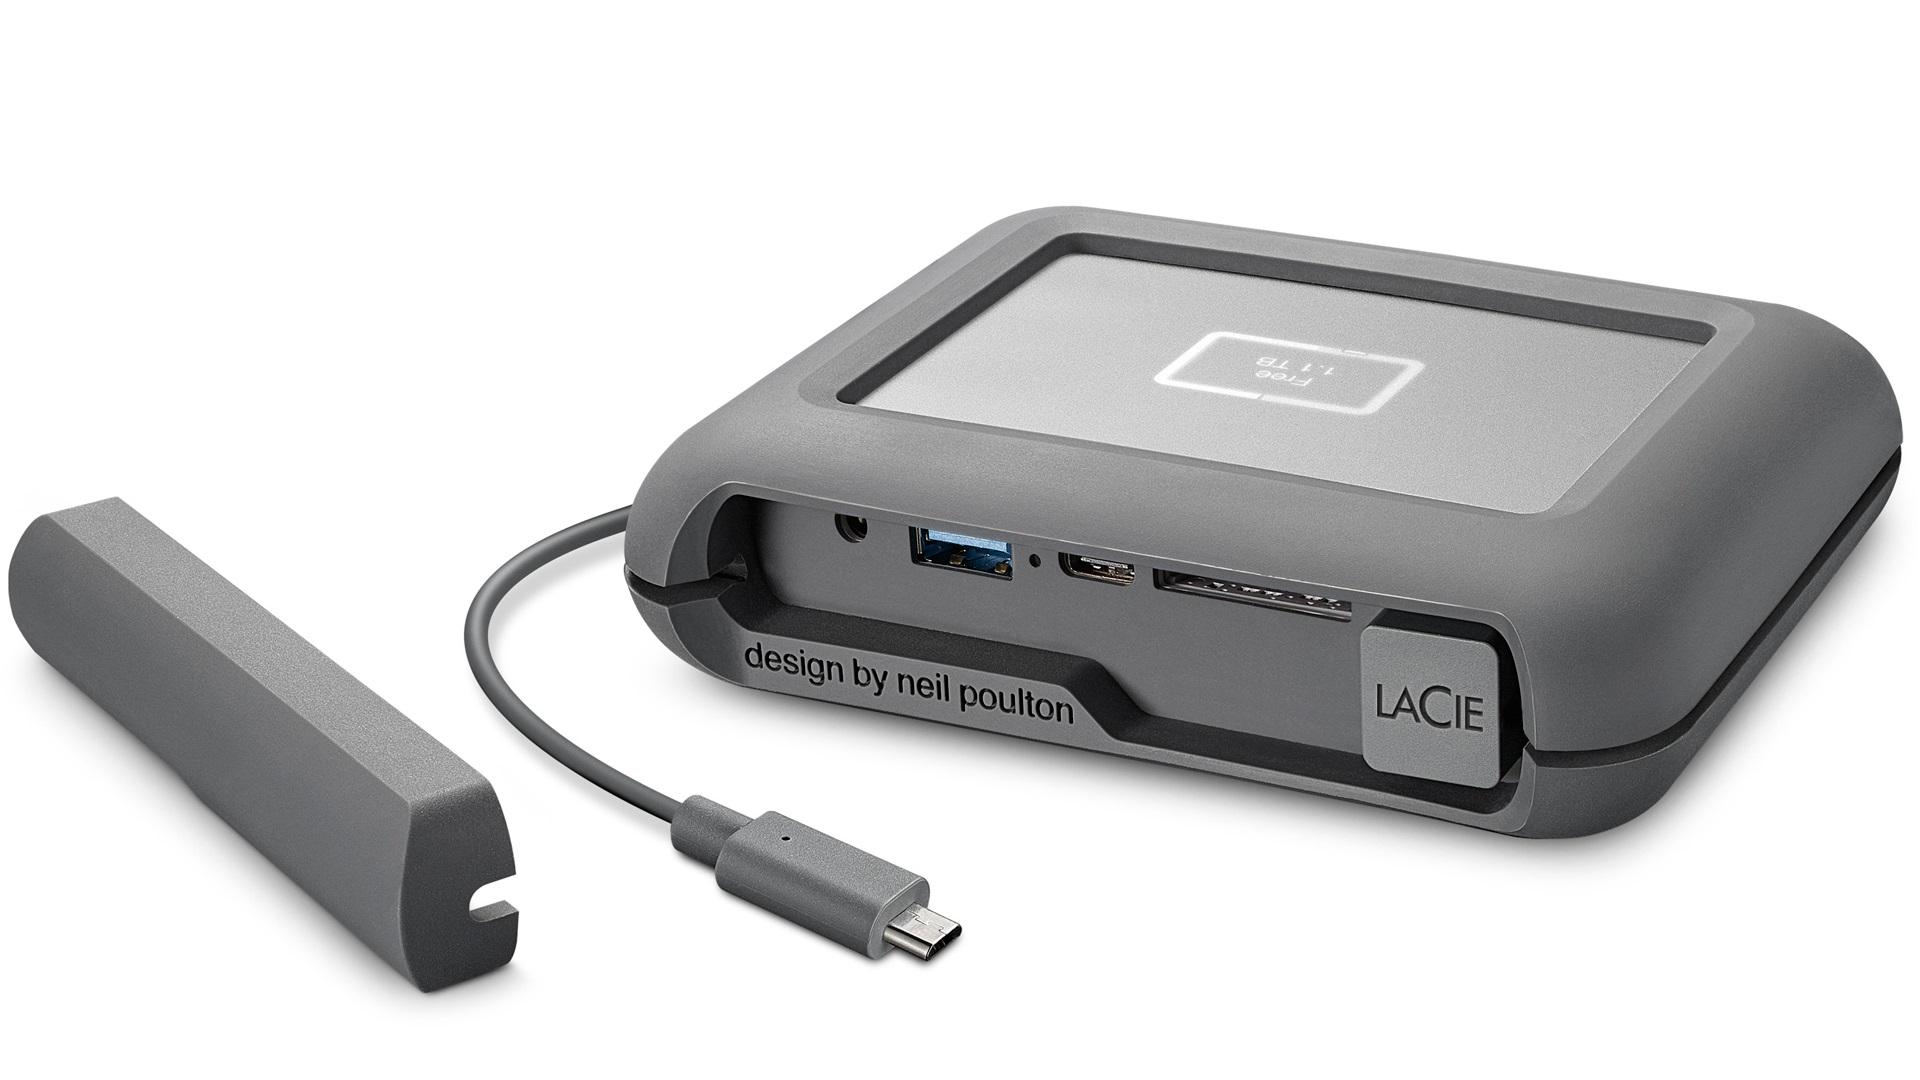 4b11a1c43 LaCie DJI Copilot - Backup on Location Without Laptop